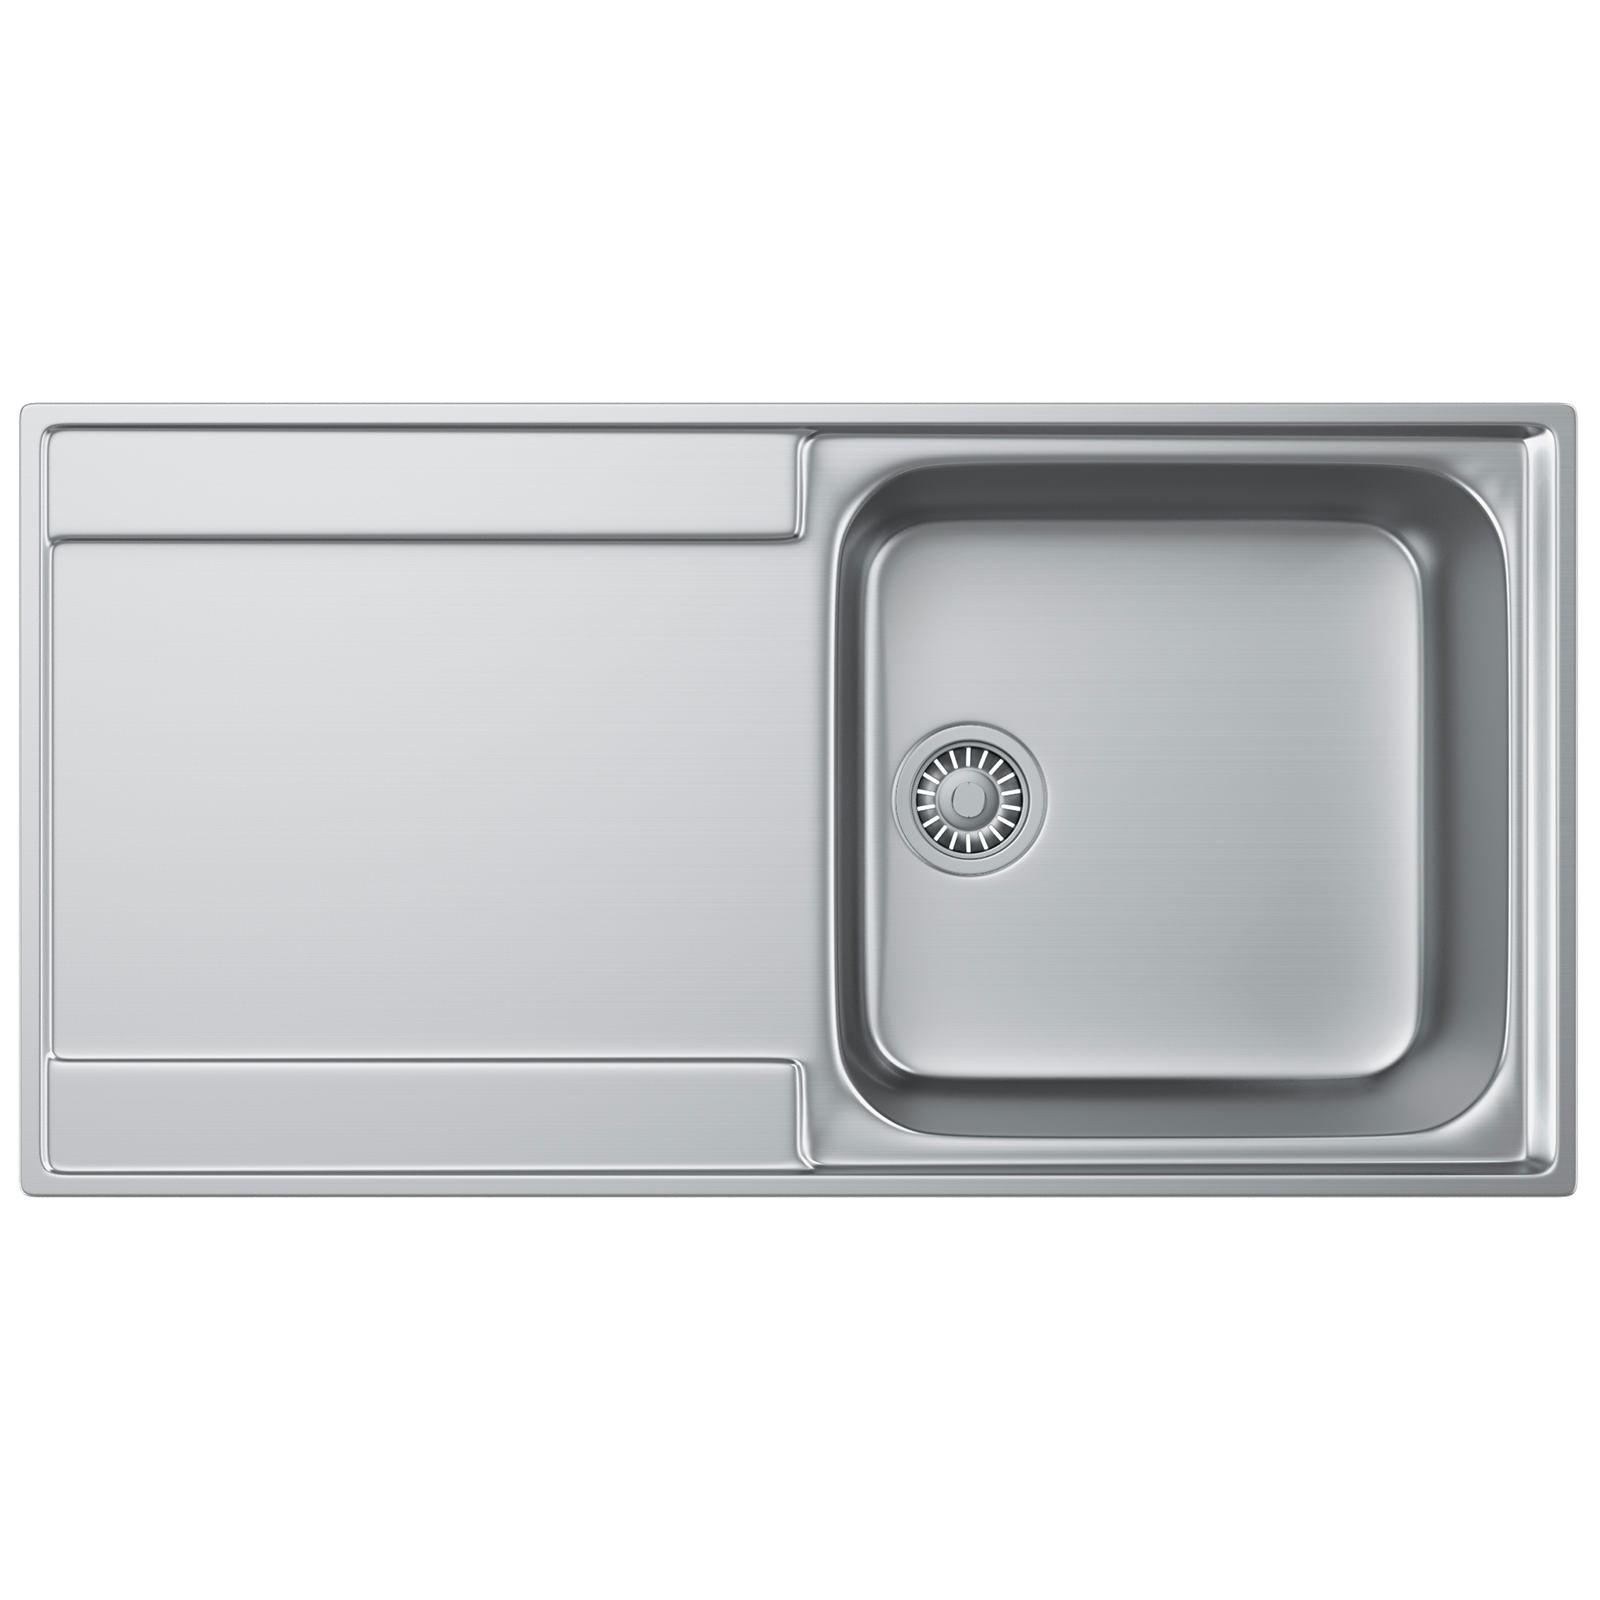 Franke Sink Tops : Franke Maris Slim-Top MRX 211 Stainless Steel 1.0 Bowl Kitchen Inset ...